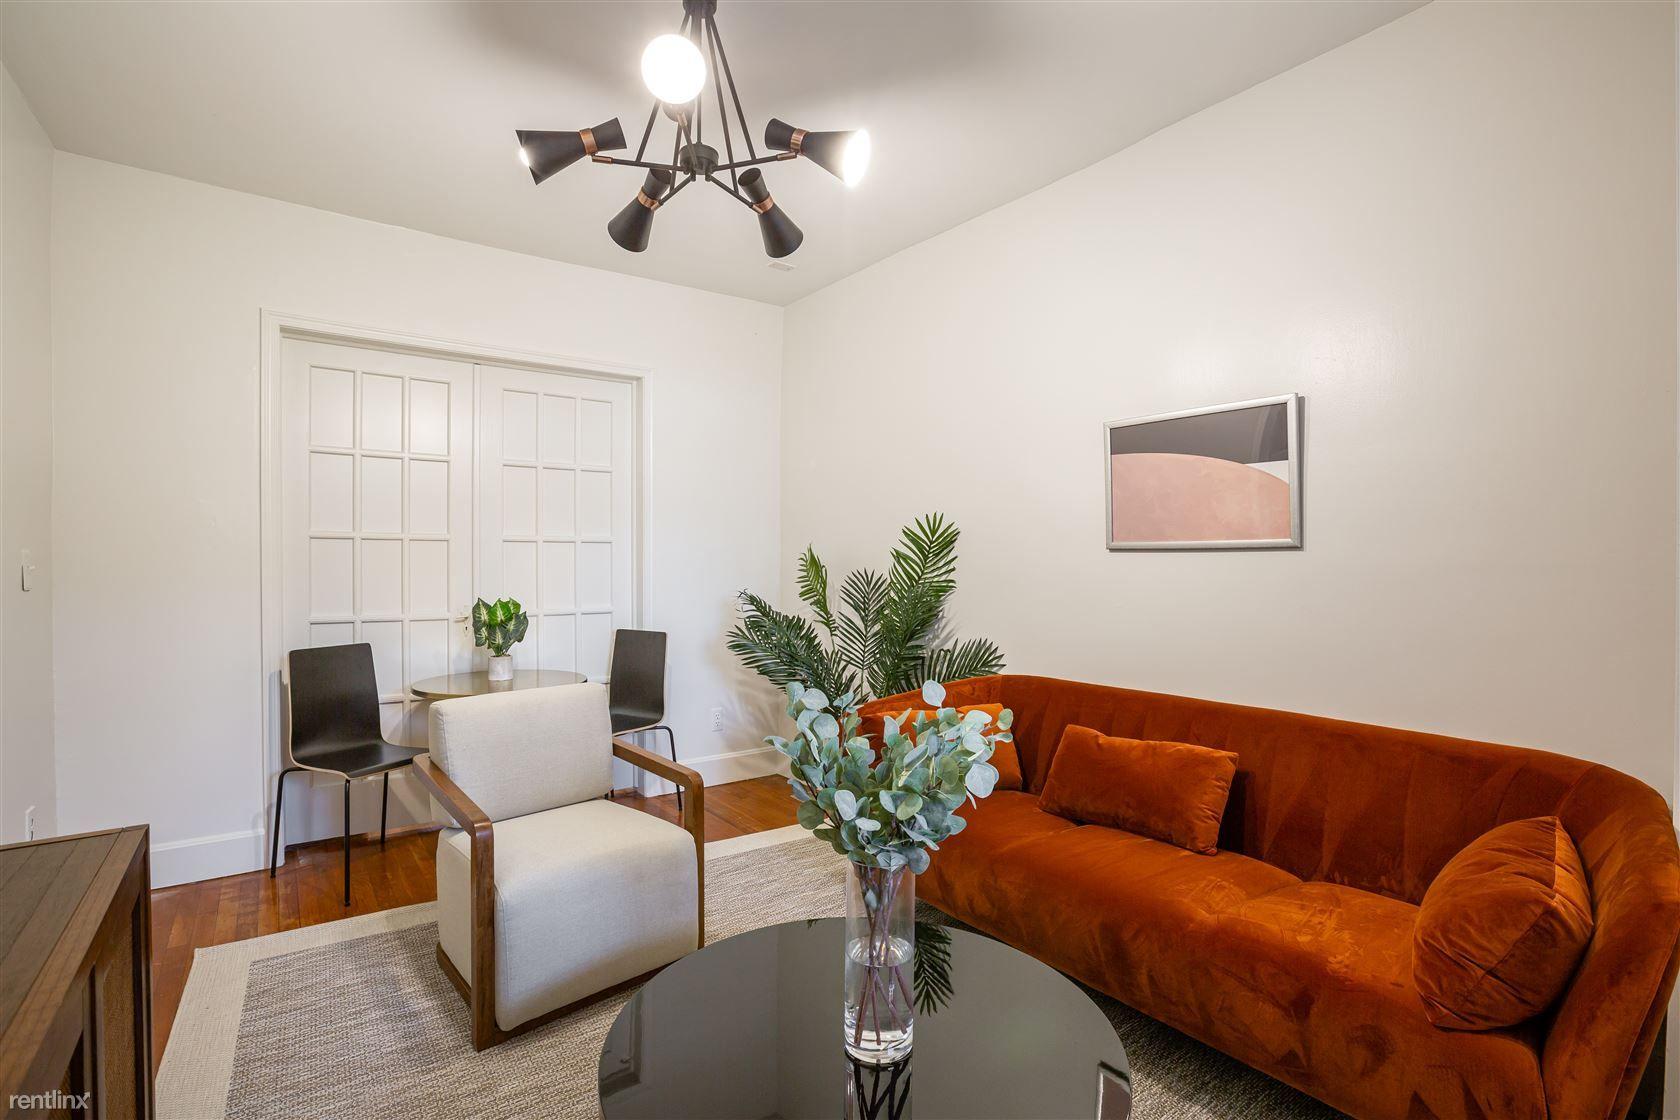 756 Fairmont Street Northwest, Washington DC, DC, 20001 rental